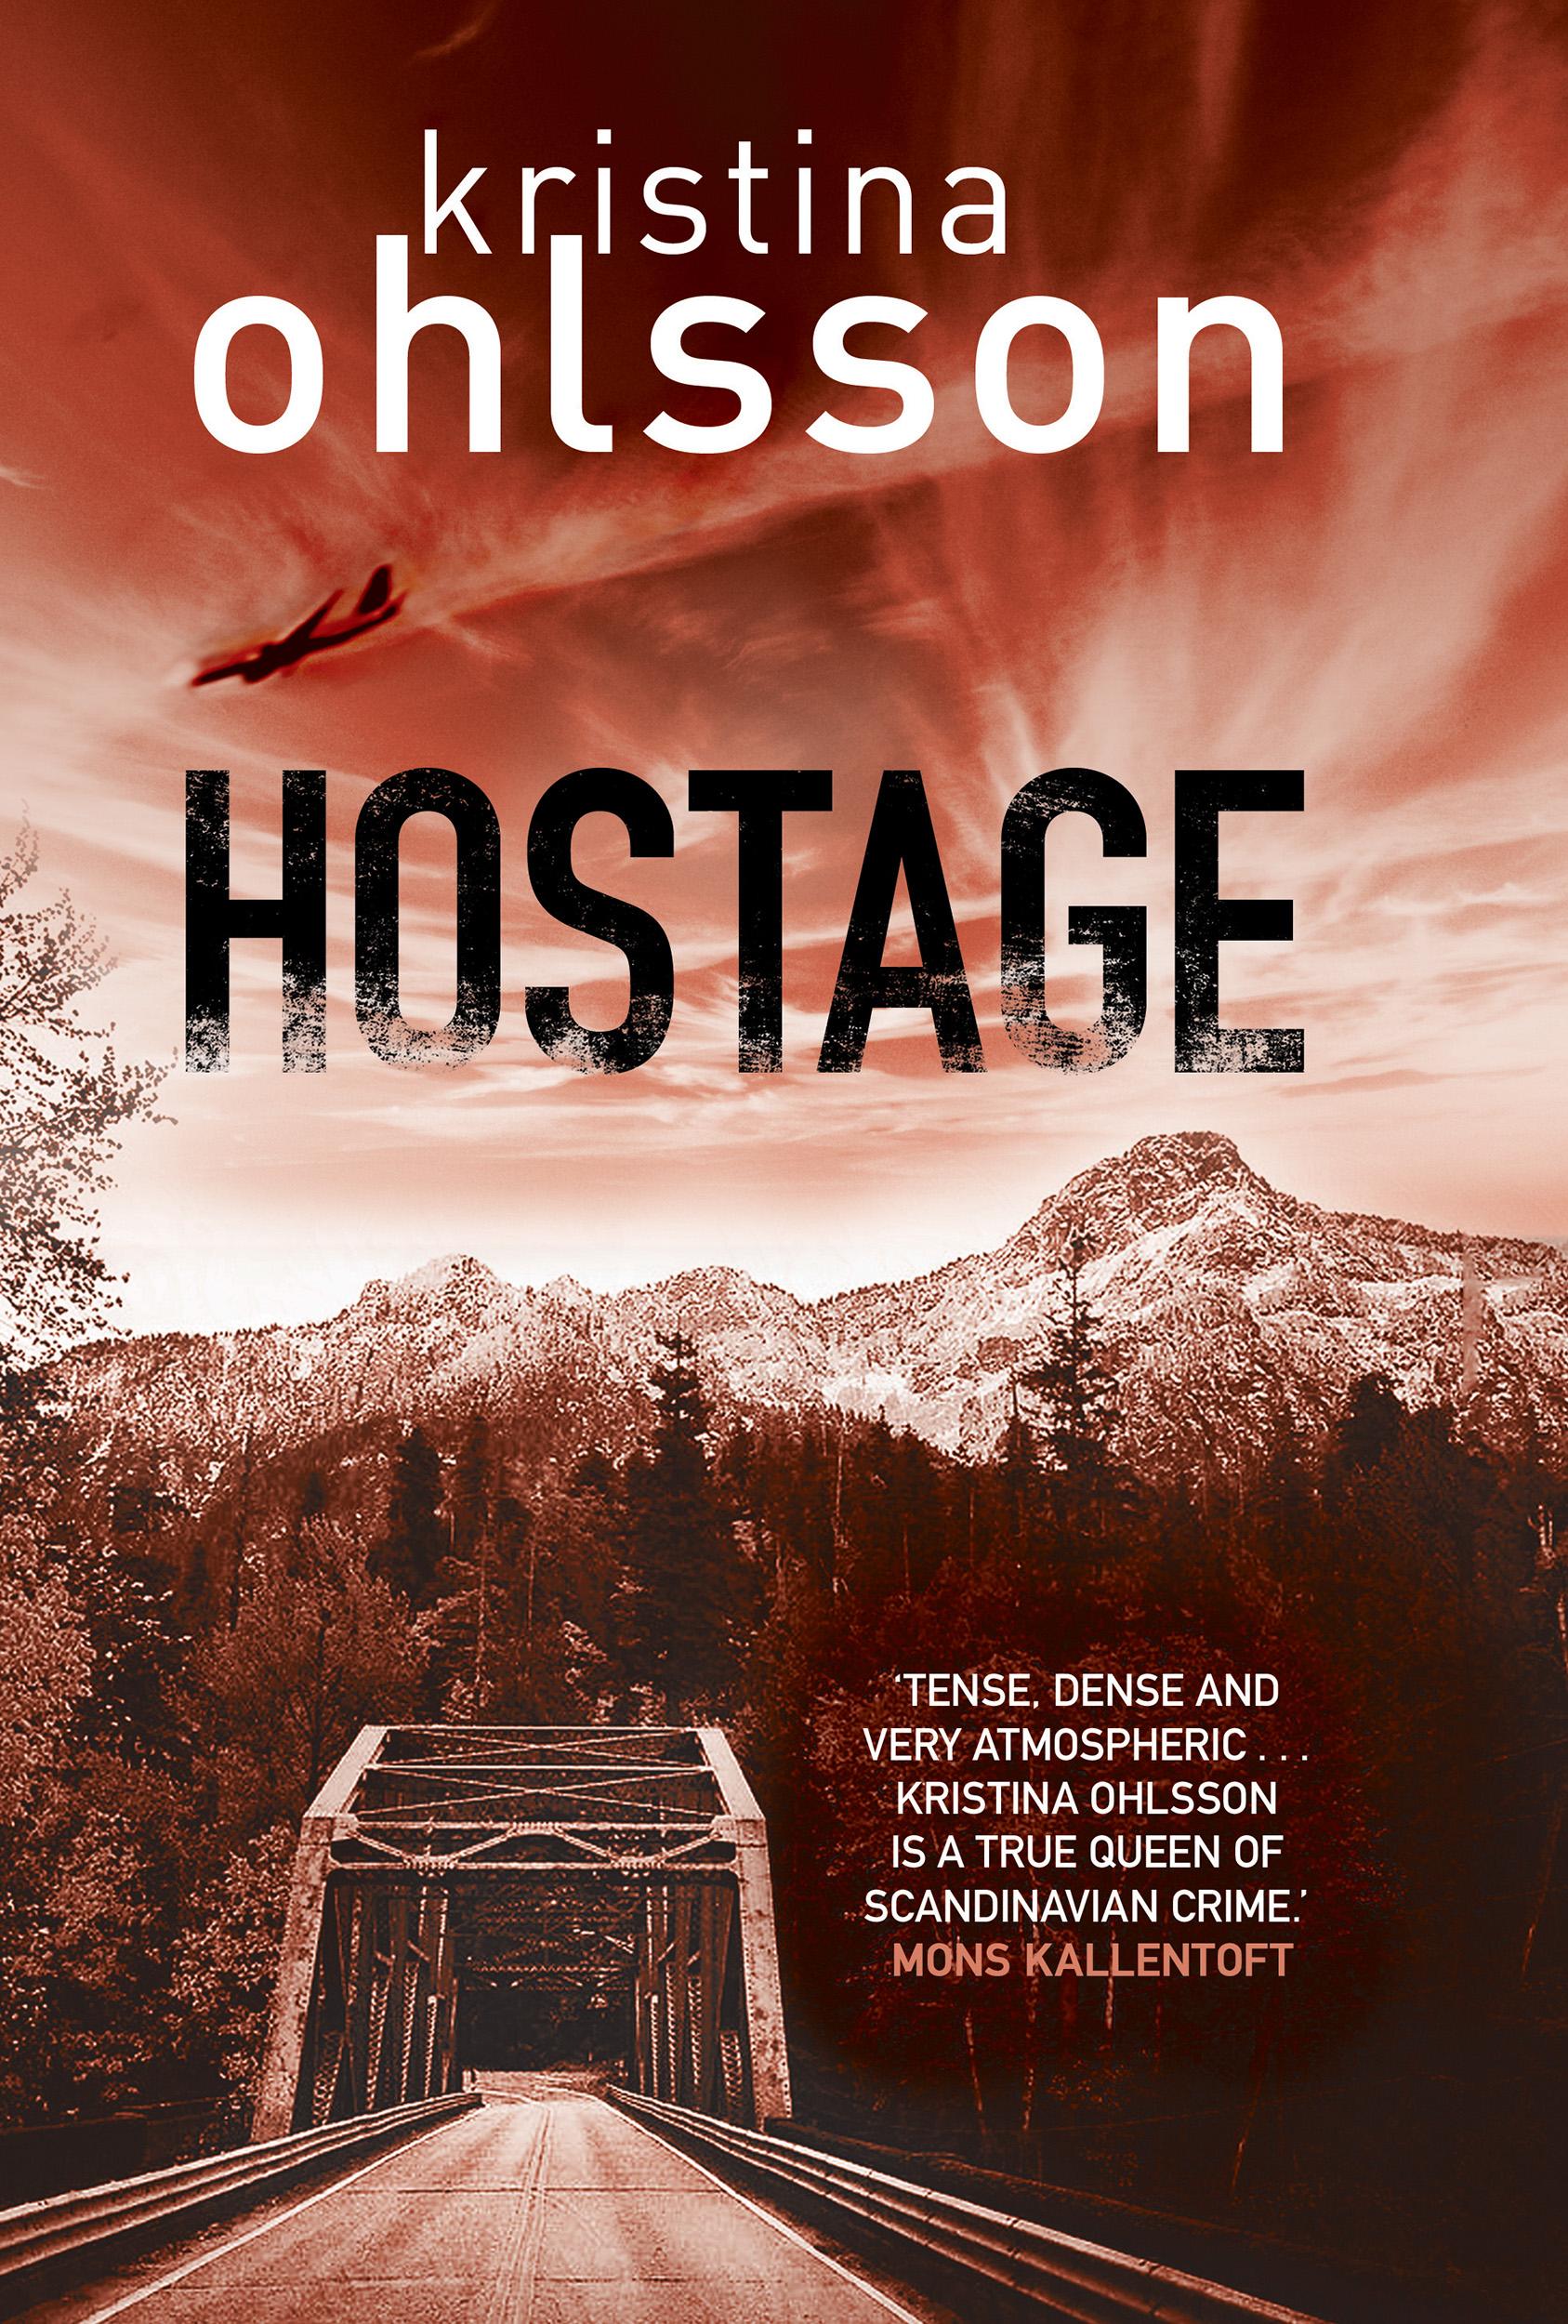 Download ebook kristina ohlsson